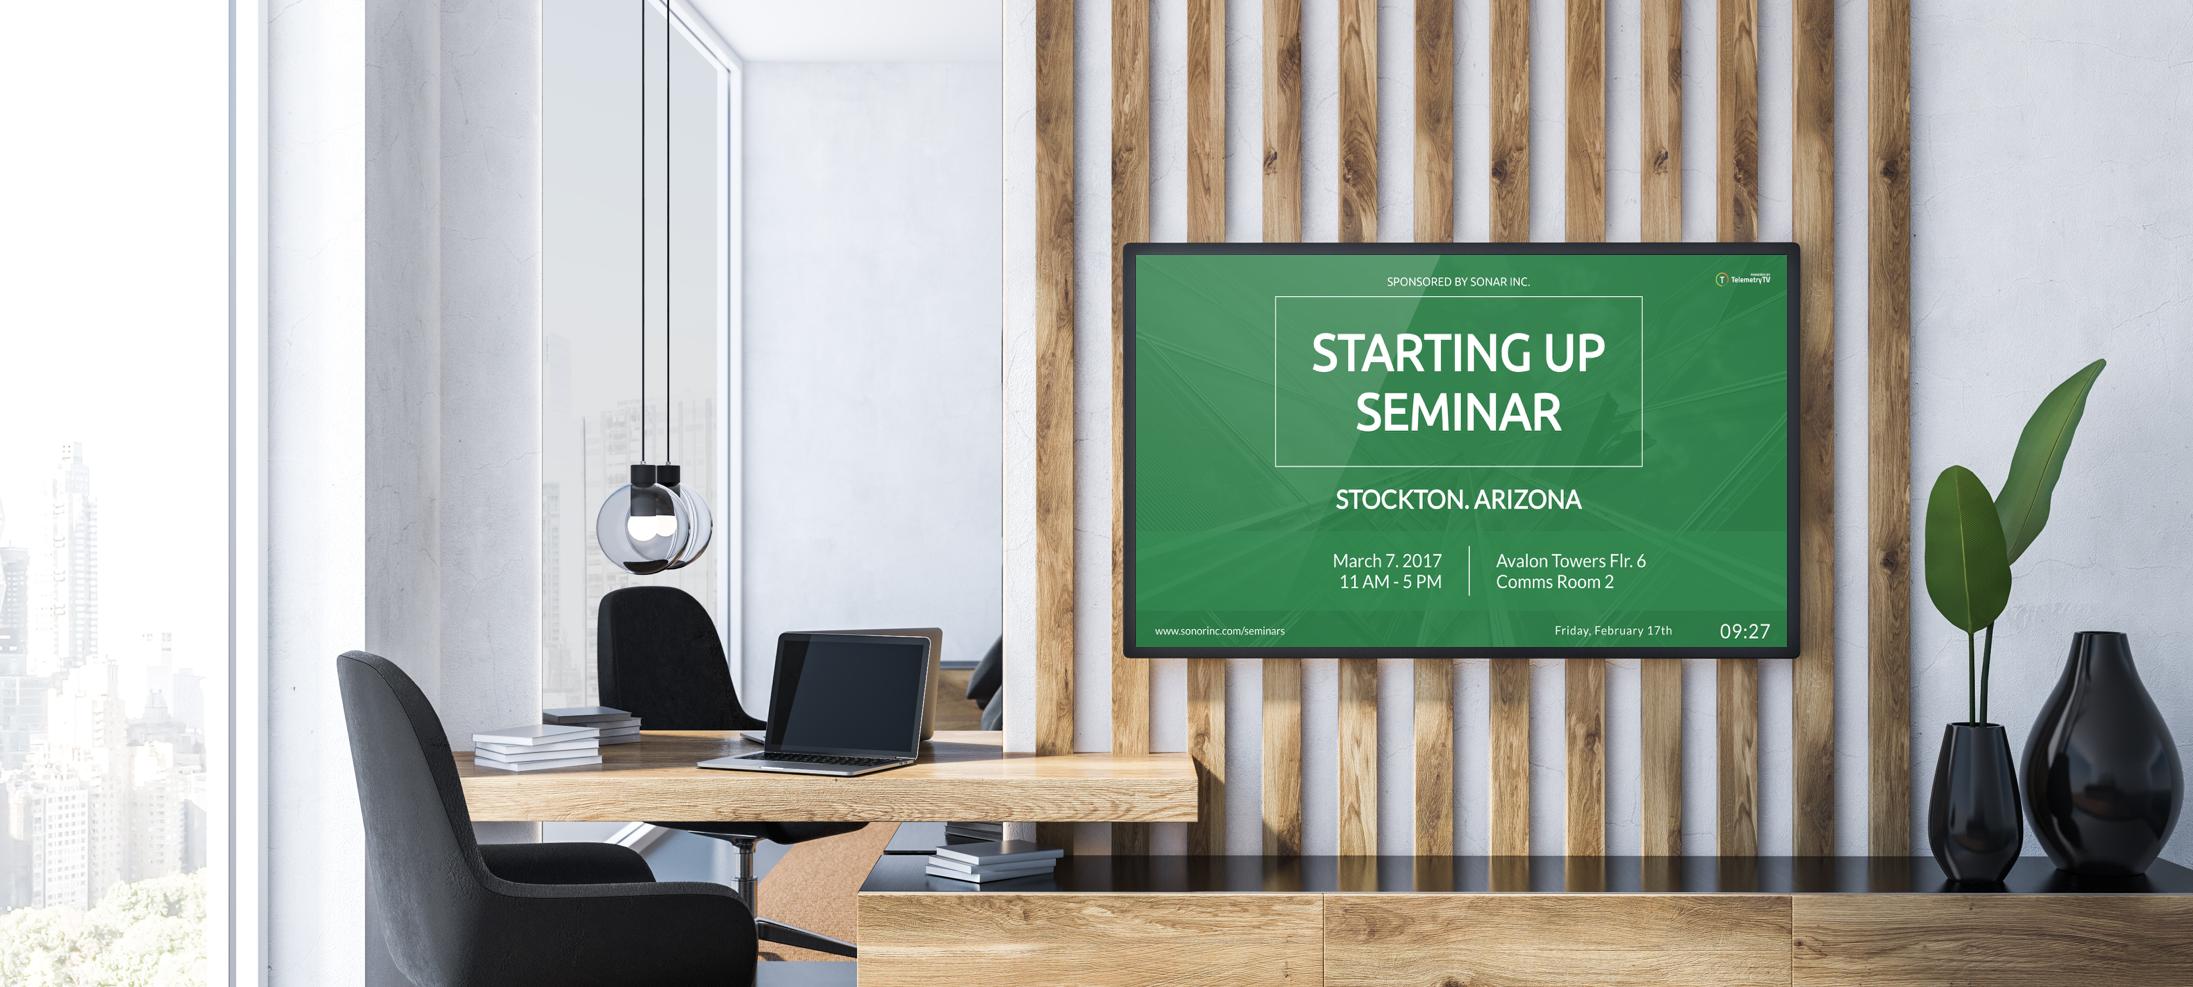 cloud based meeting room digital signage example